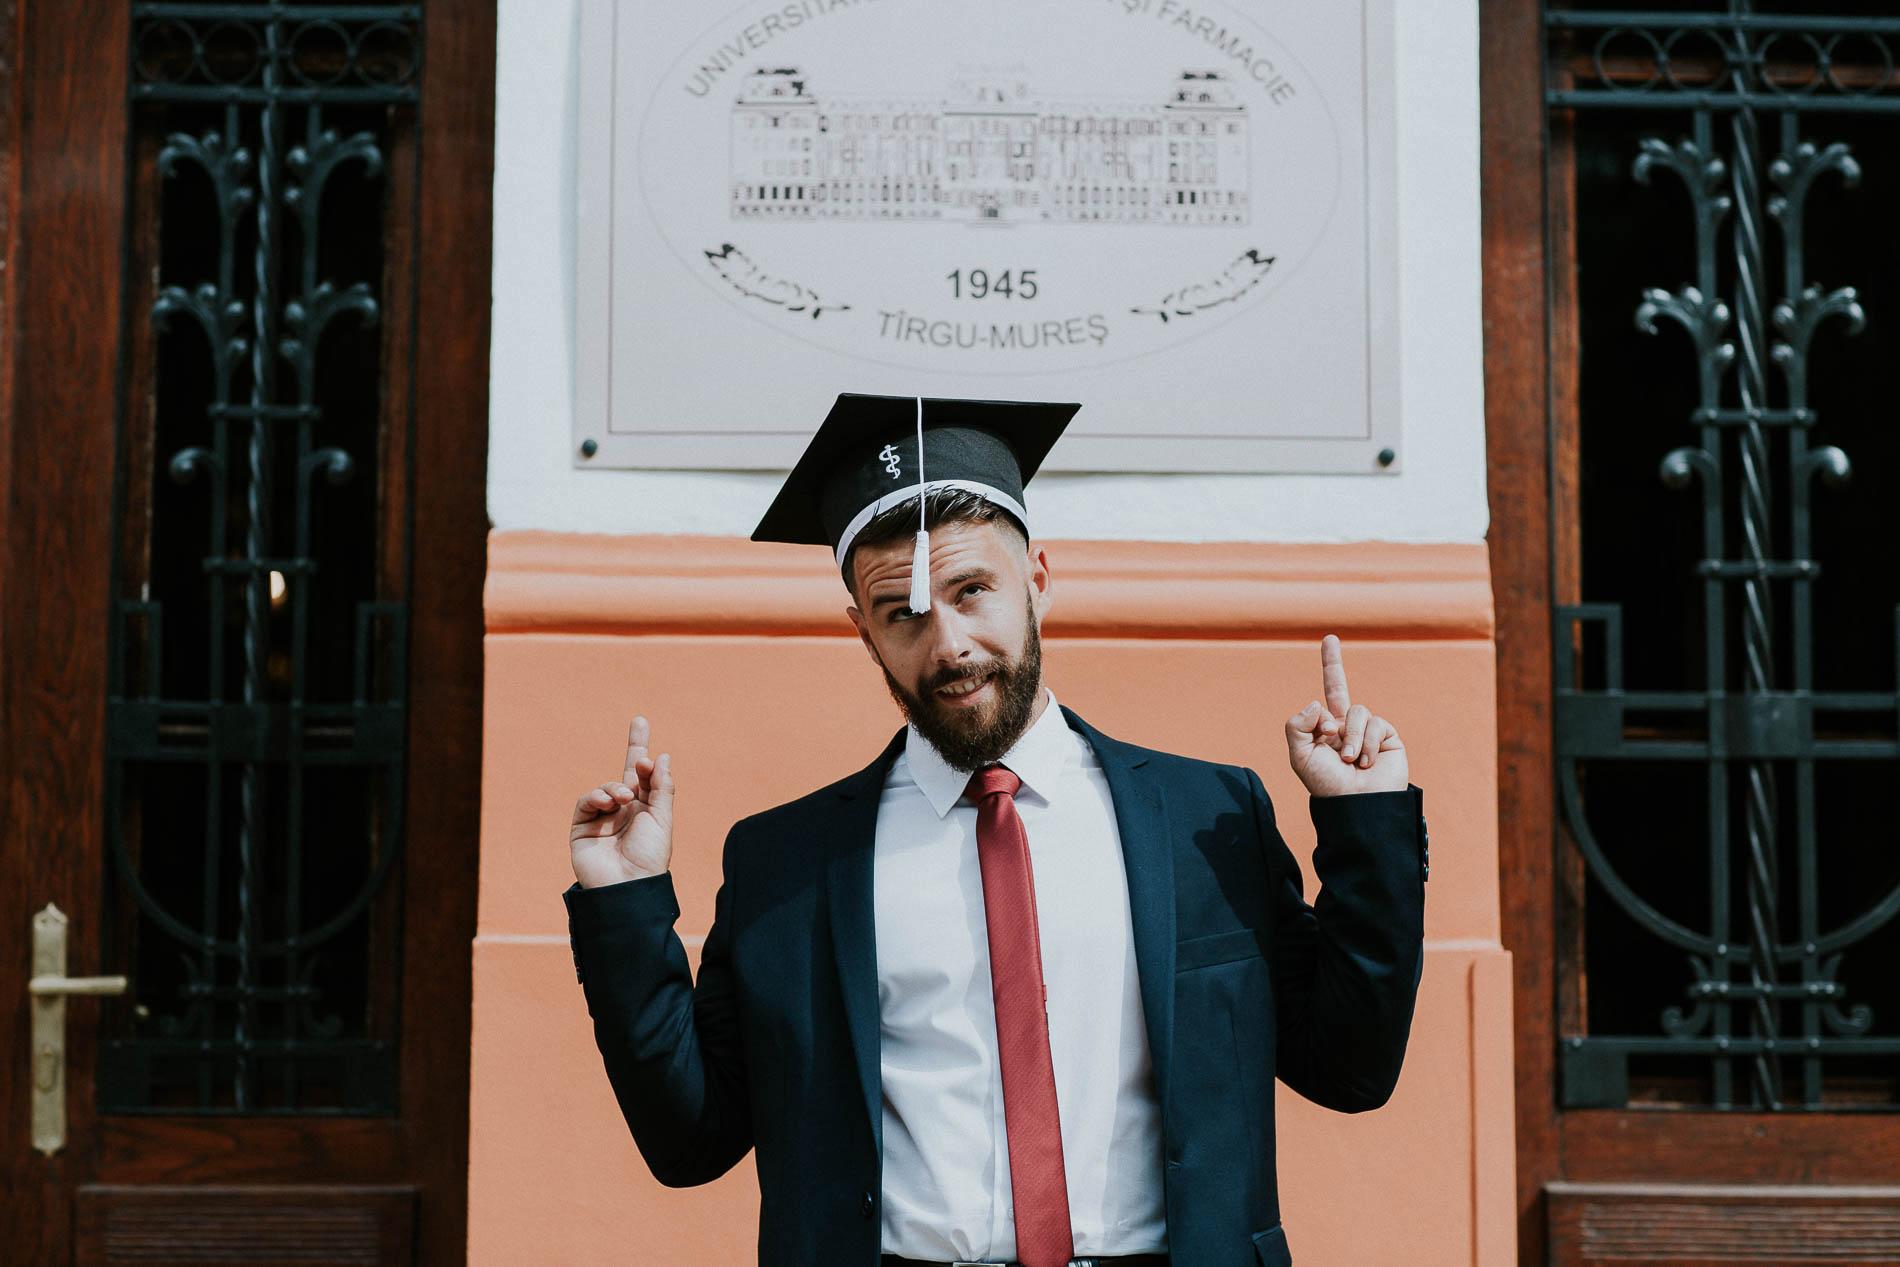 fotografii de absolvire senior portrait foto portret universitatea de medicina si farmacie targu mures16